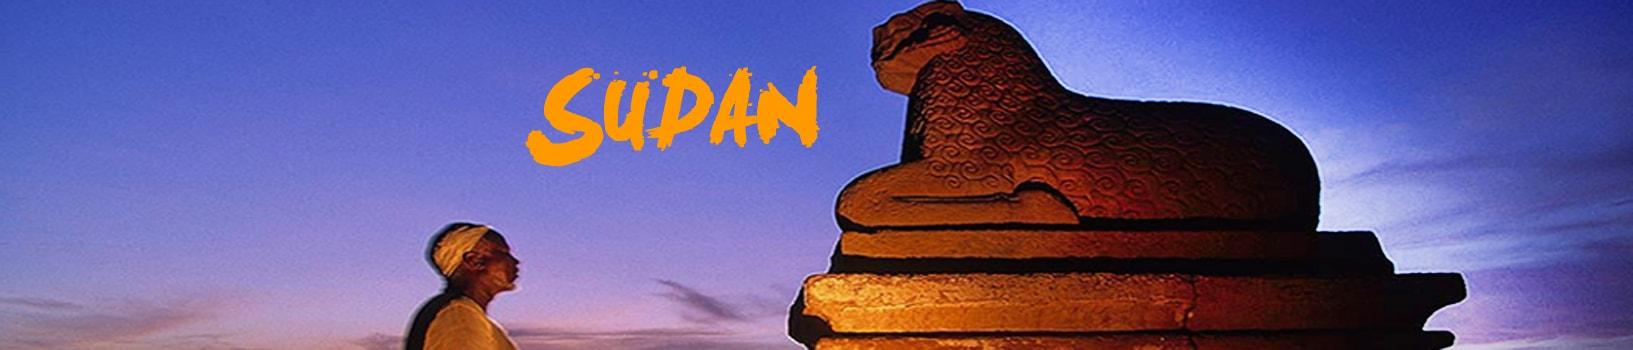 viaje-sudán